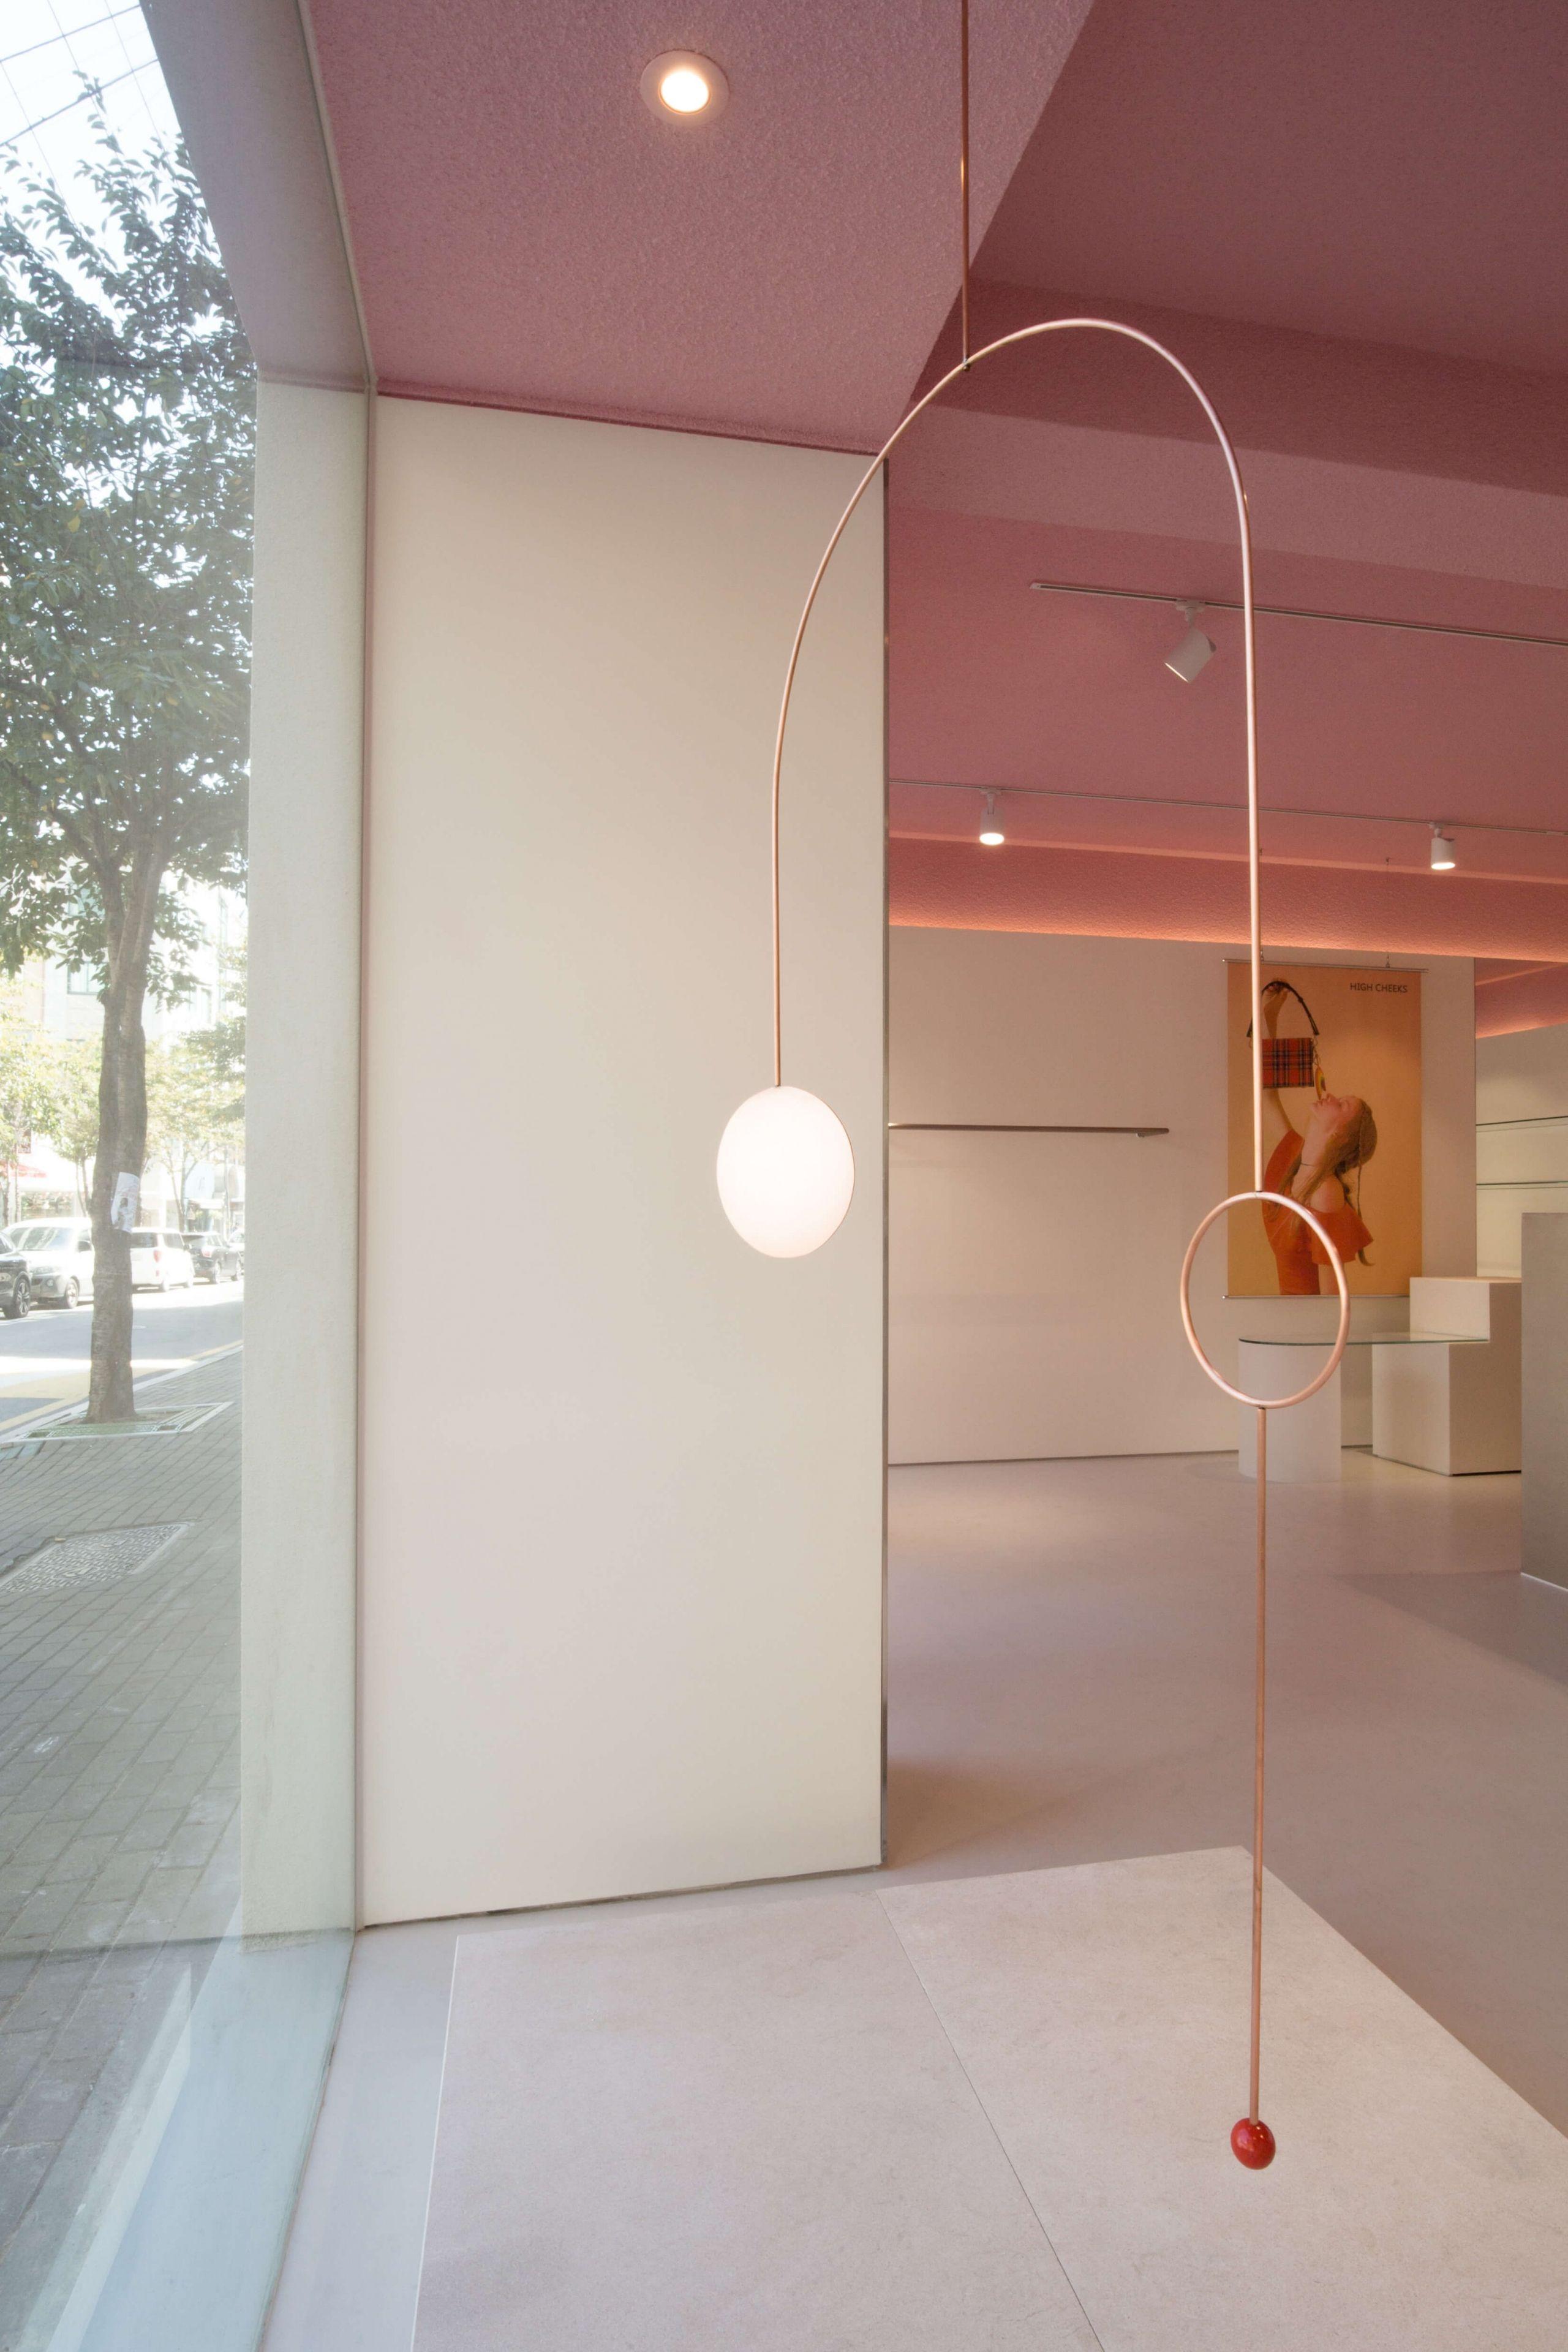 Studio unravel high cheeks lifestyle for Iluminacion minimalista interiores